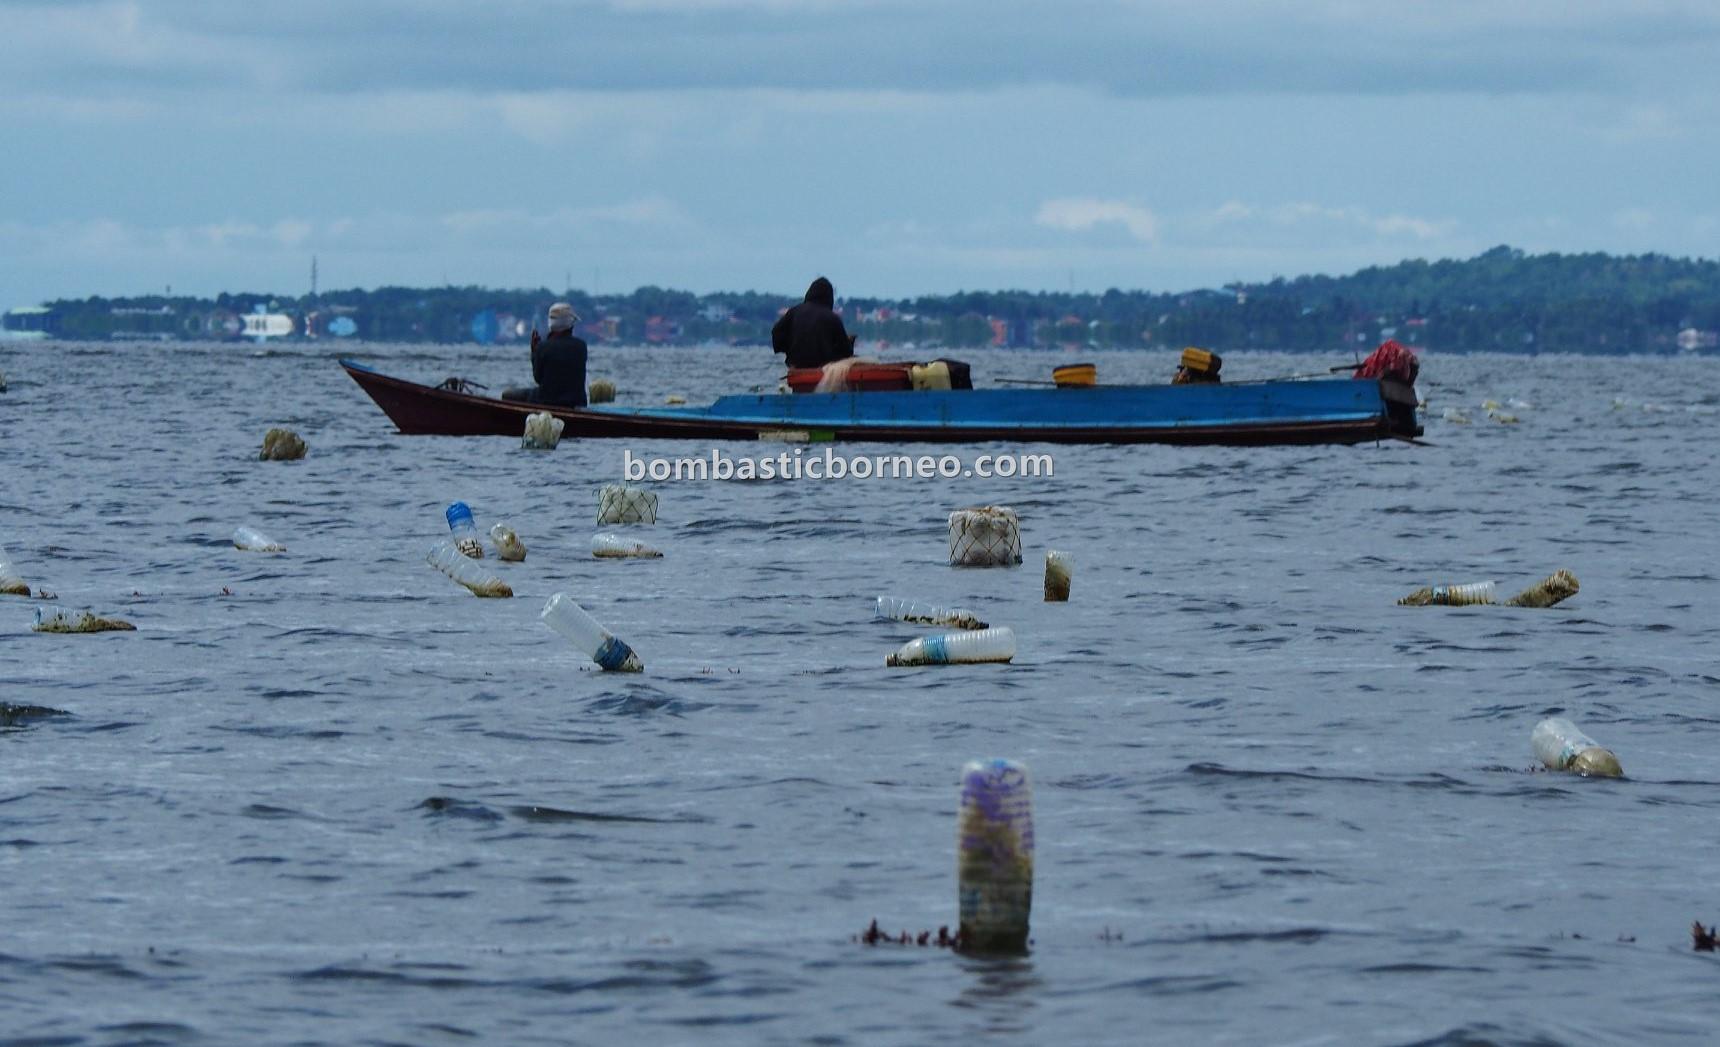 Pulau Nunukan, Sebatik Island, rumput laut, jelajah, exploration, adventure, Sabah, Malaysia, Indonesia, Kalimantan Utara, tourism, seaweed farming, Travel Guide, Trans Border, Borneo,